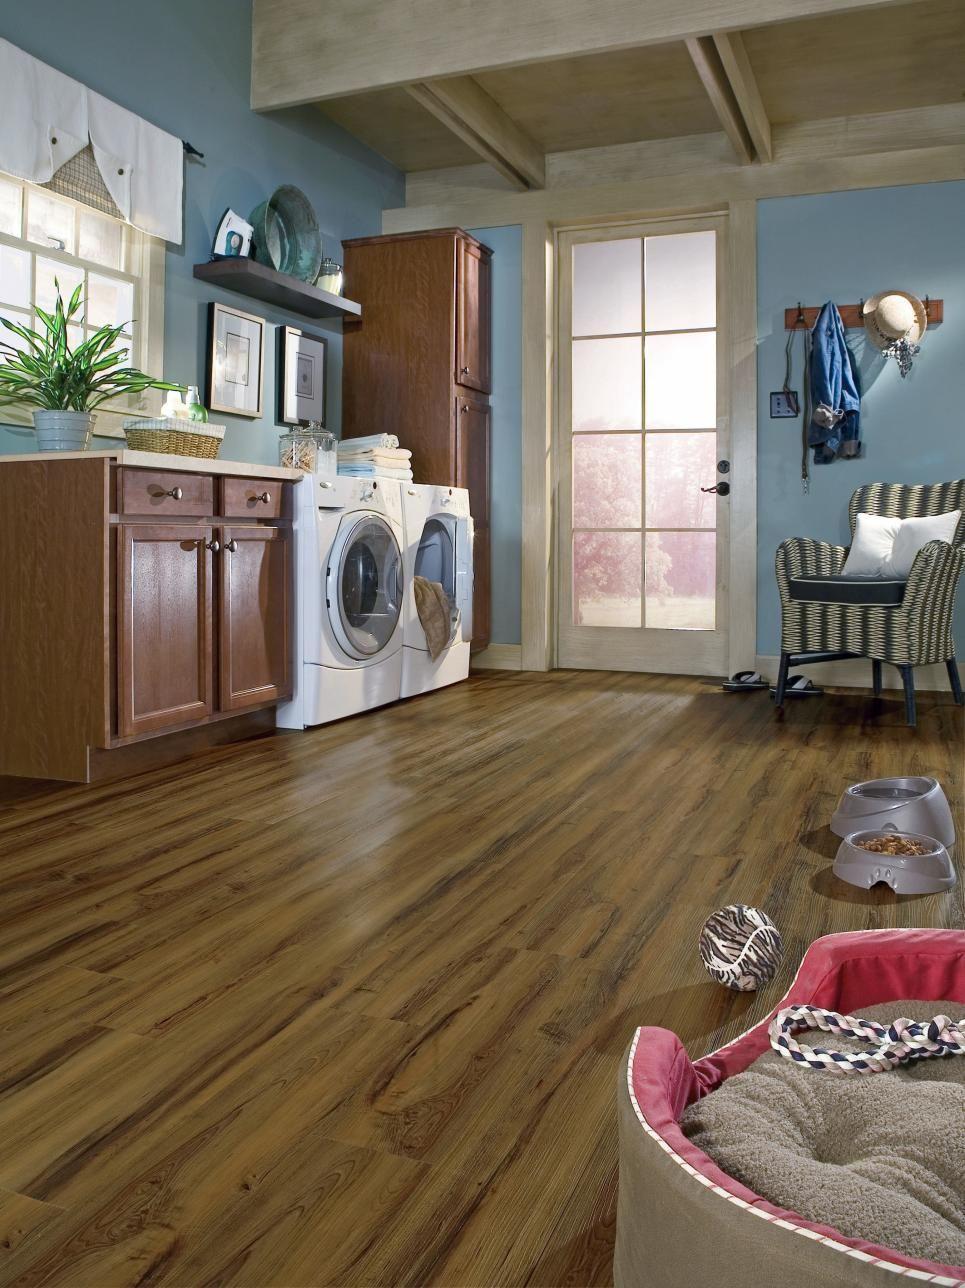 8 Flooring Trends To Try Flooring Trends Laundry Room Design